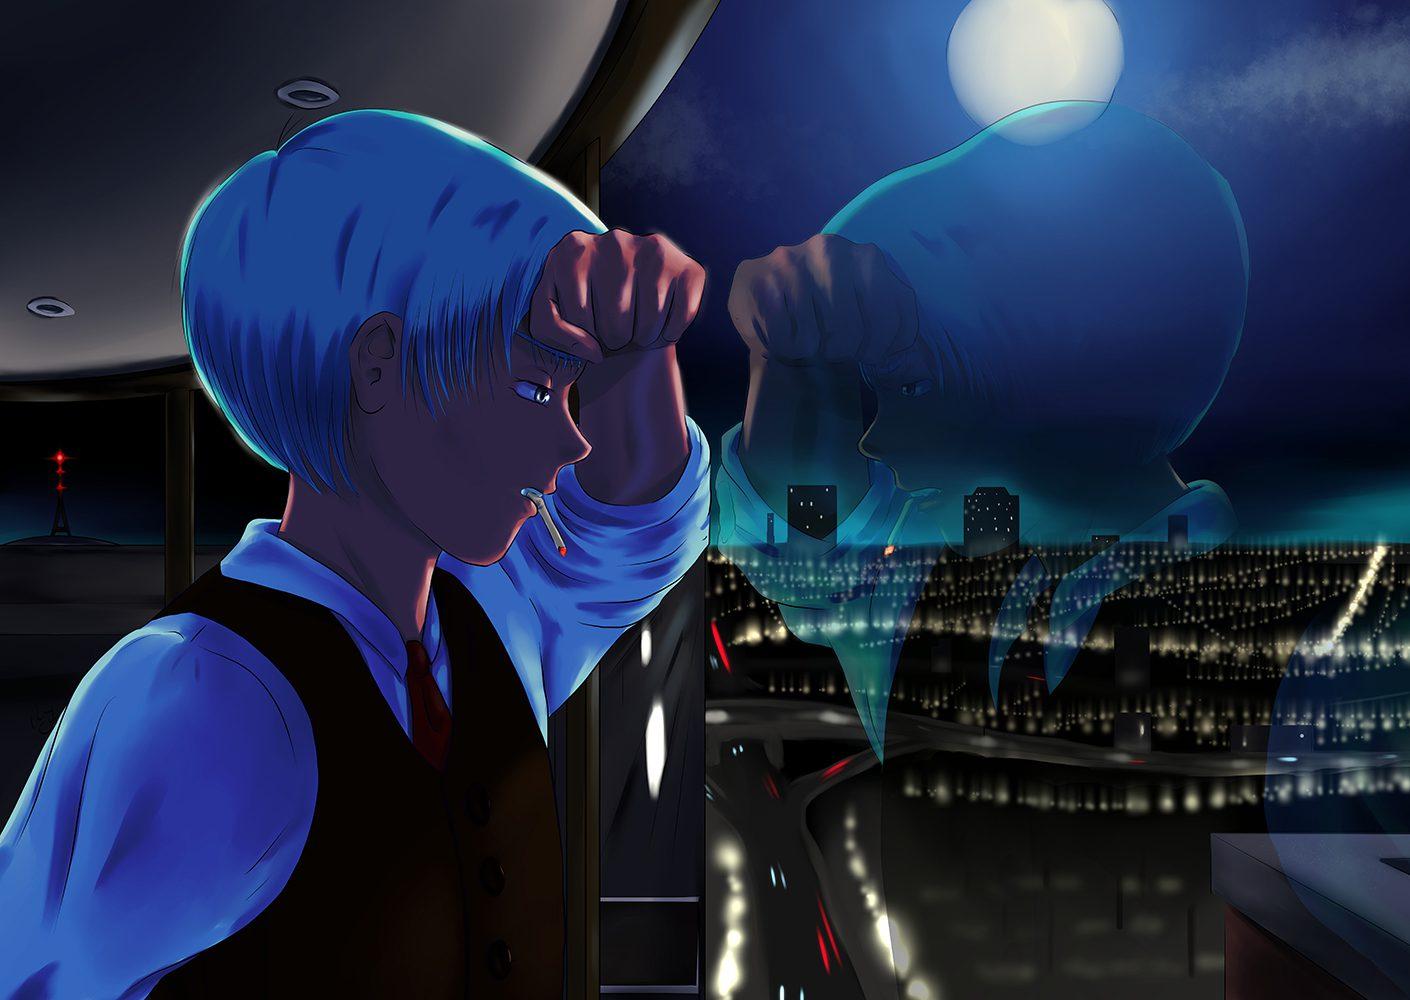 City Window 2 anime illustration